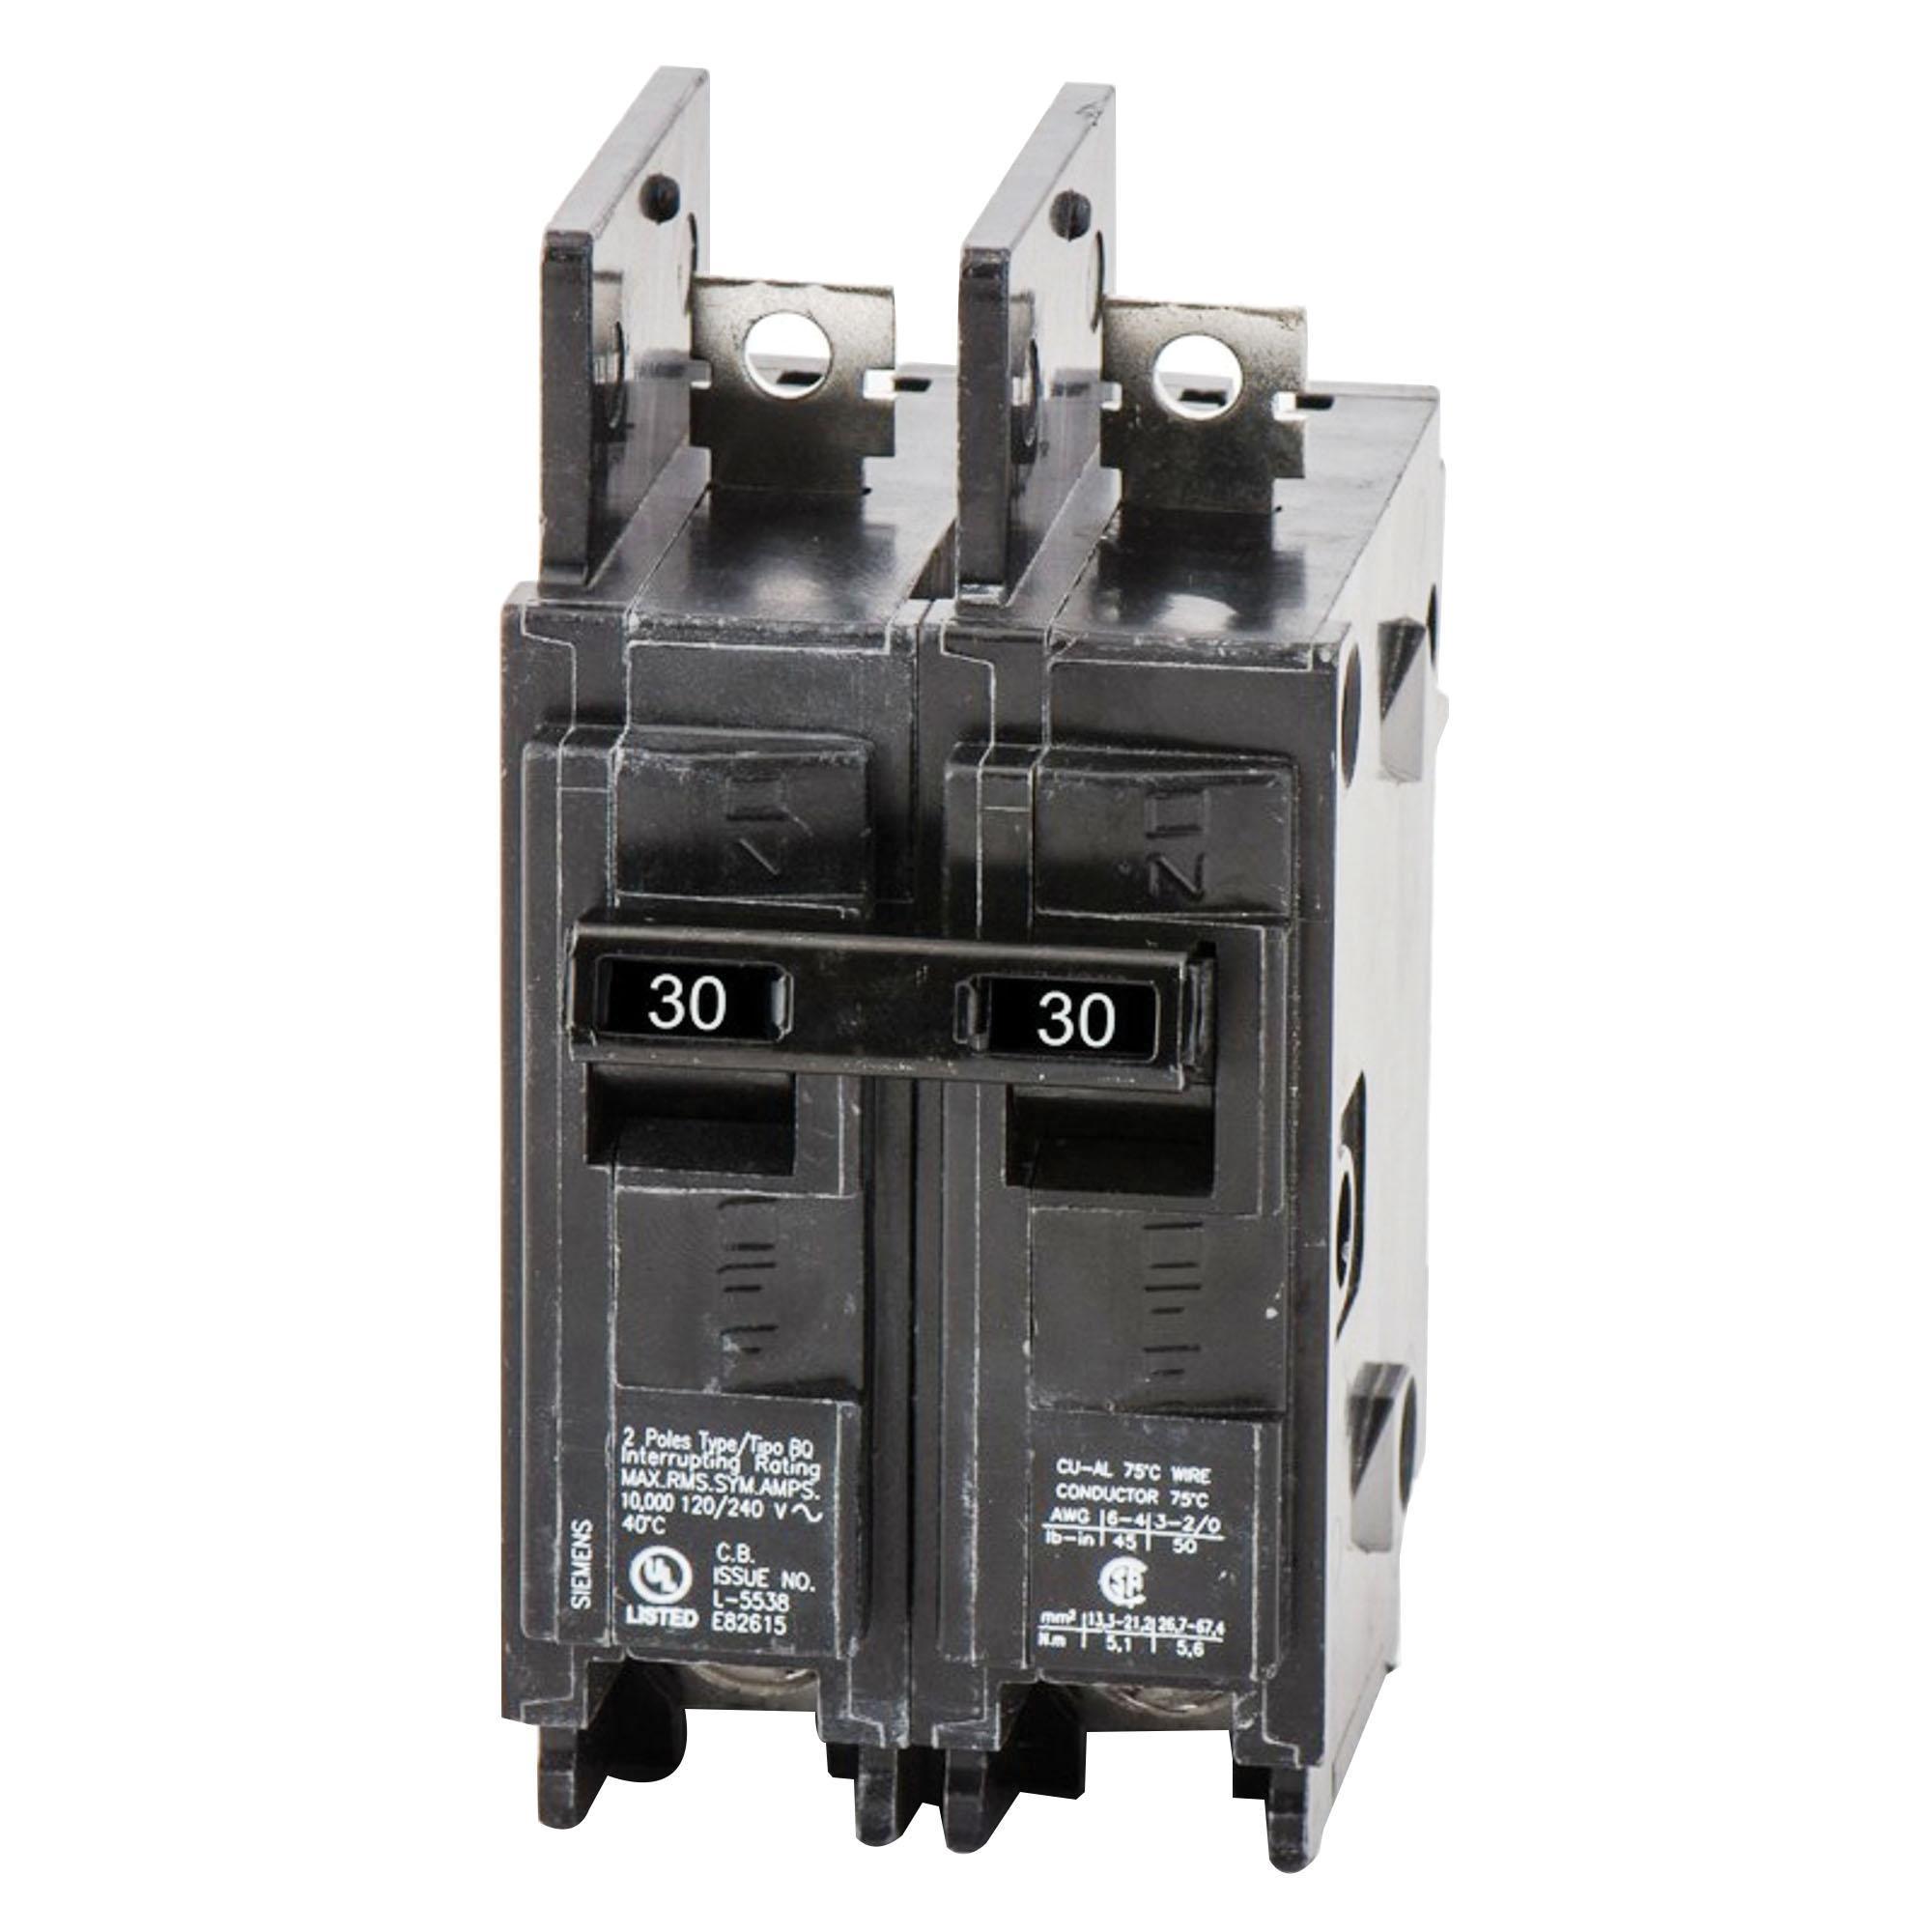 siemens bq2b030 bolt-on mount type bq molded case circuit breaker 2-pole 30- amp 120/240-volt ac - molded case circuit breakers - breakers and fuses -  power